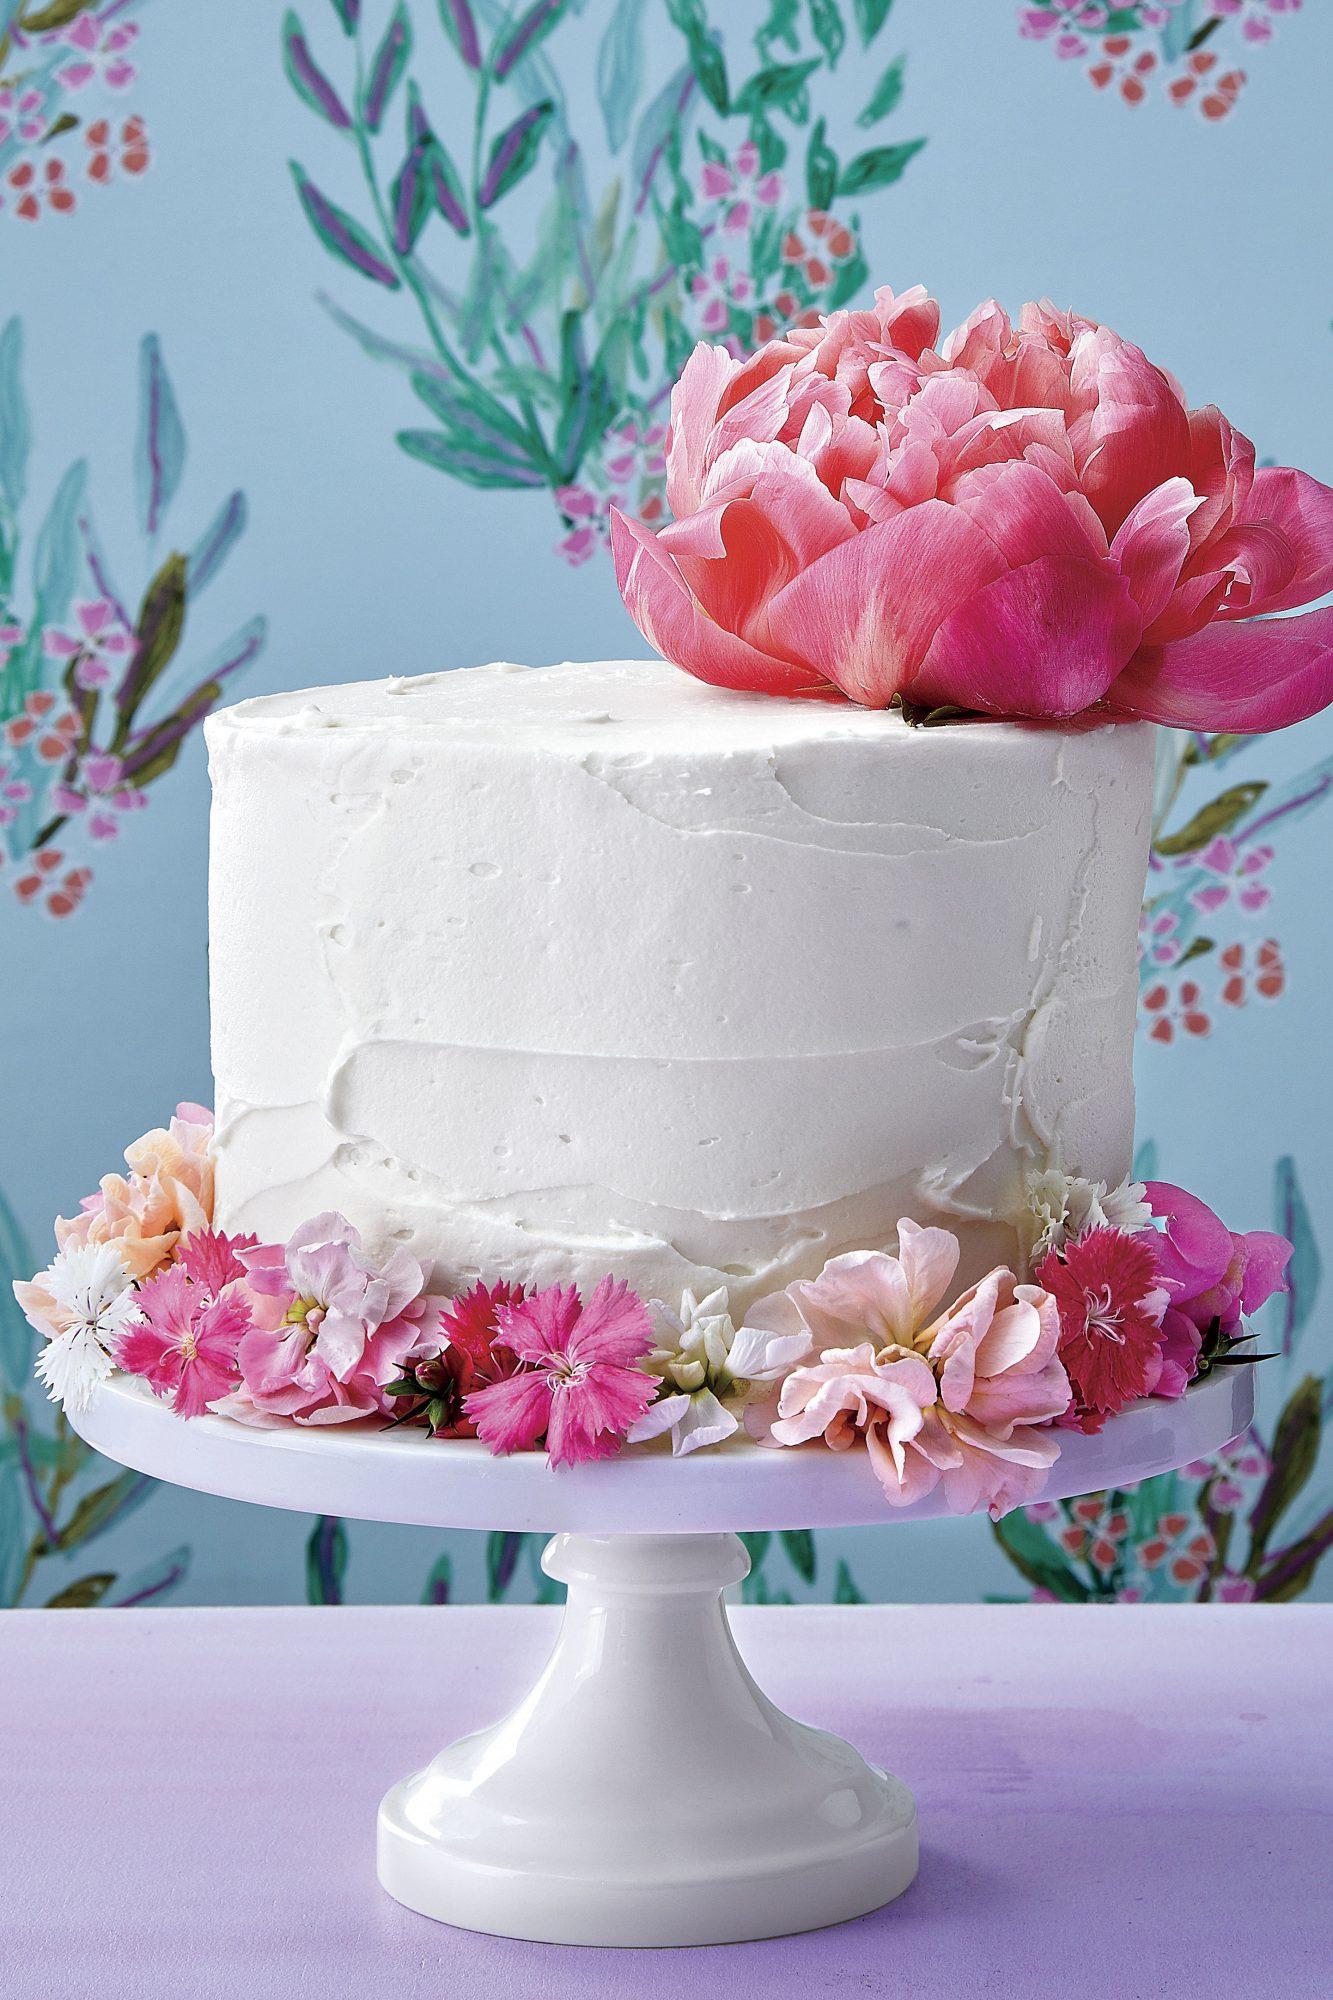 Vanilla Layer Cake with Flower Cuff